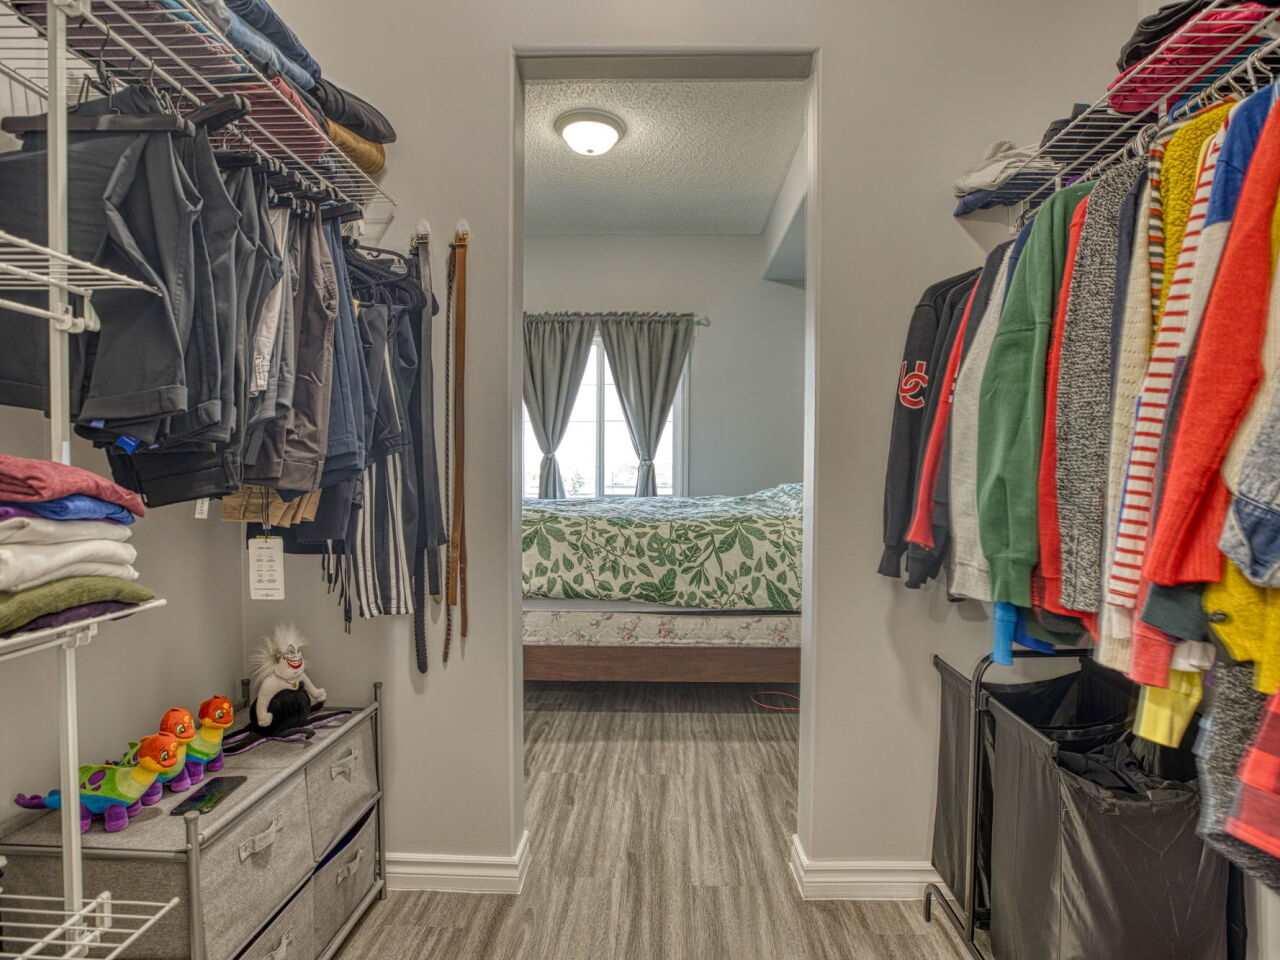 429 16807 100 Avenue - Glenwood_EDMO Lowrise Apartment for sale, 2 Bedrooms (E4234341) #21